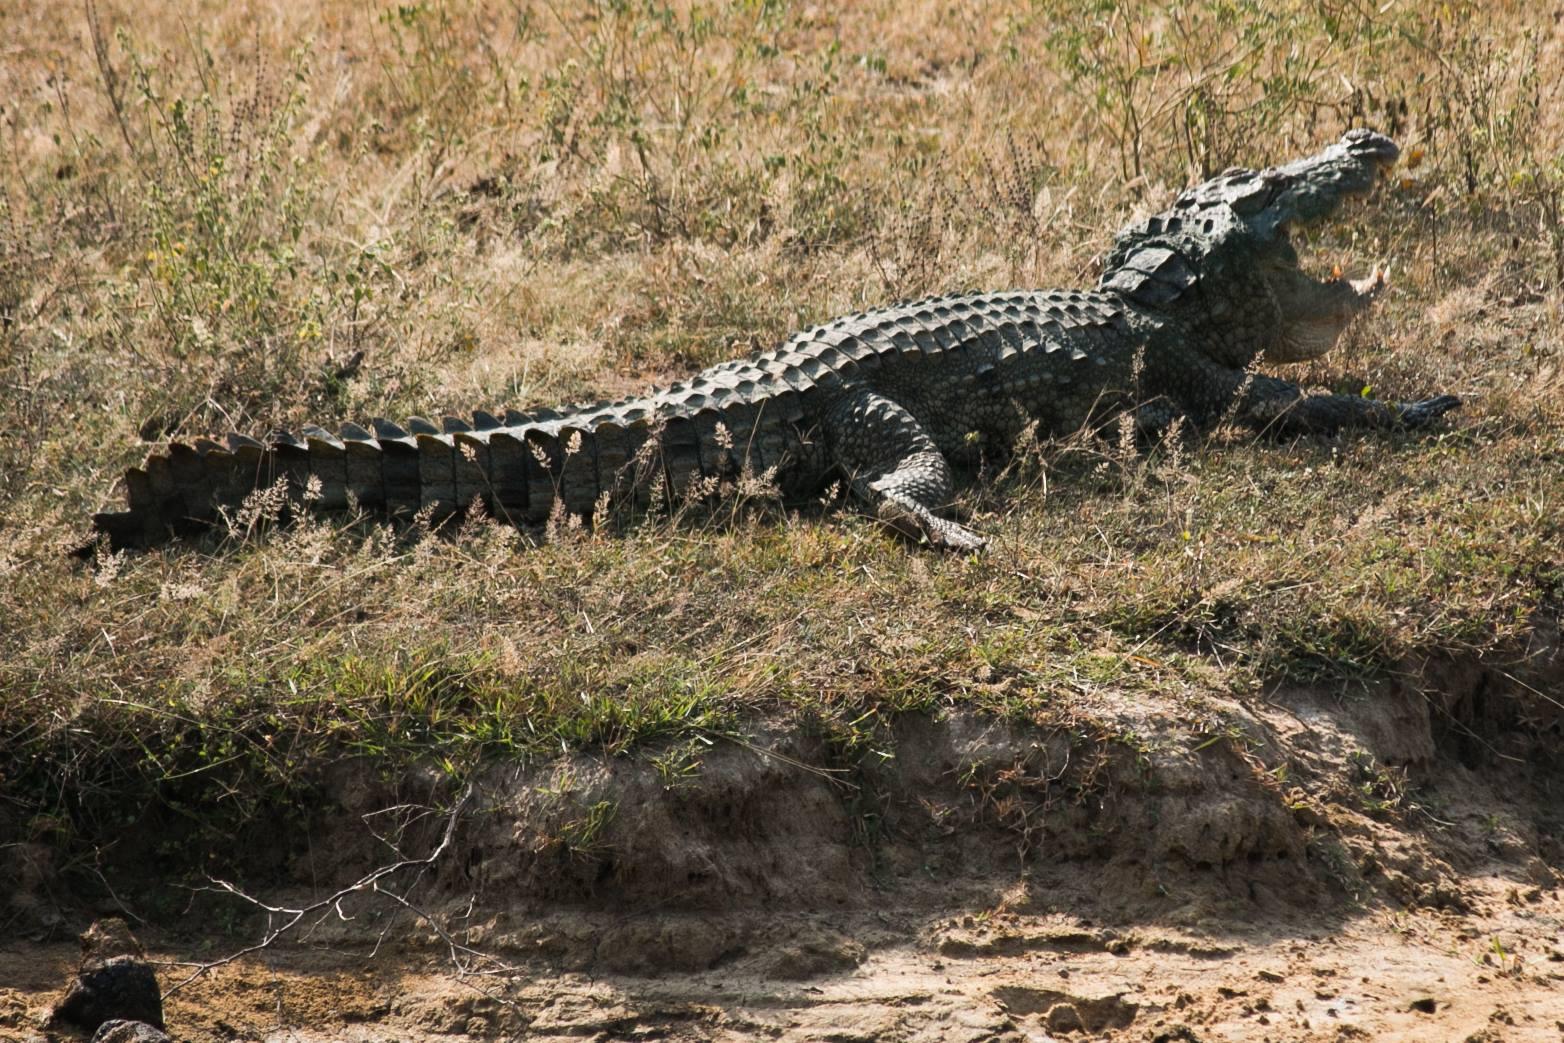 invite-to-paradise-sri-lanka-and-maldives-specialists-travel-agent-tour-operator-customer-review-feedback-joel-rhian-crocodile.jpg